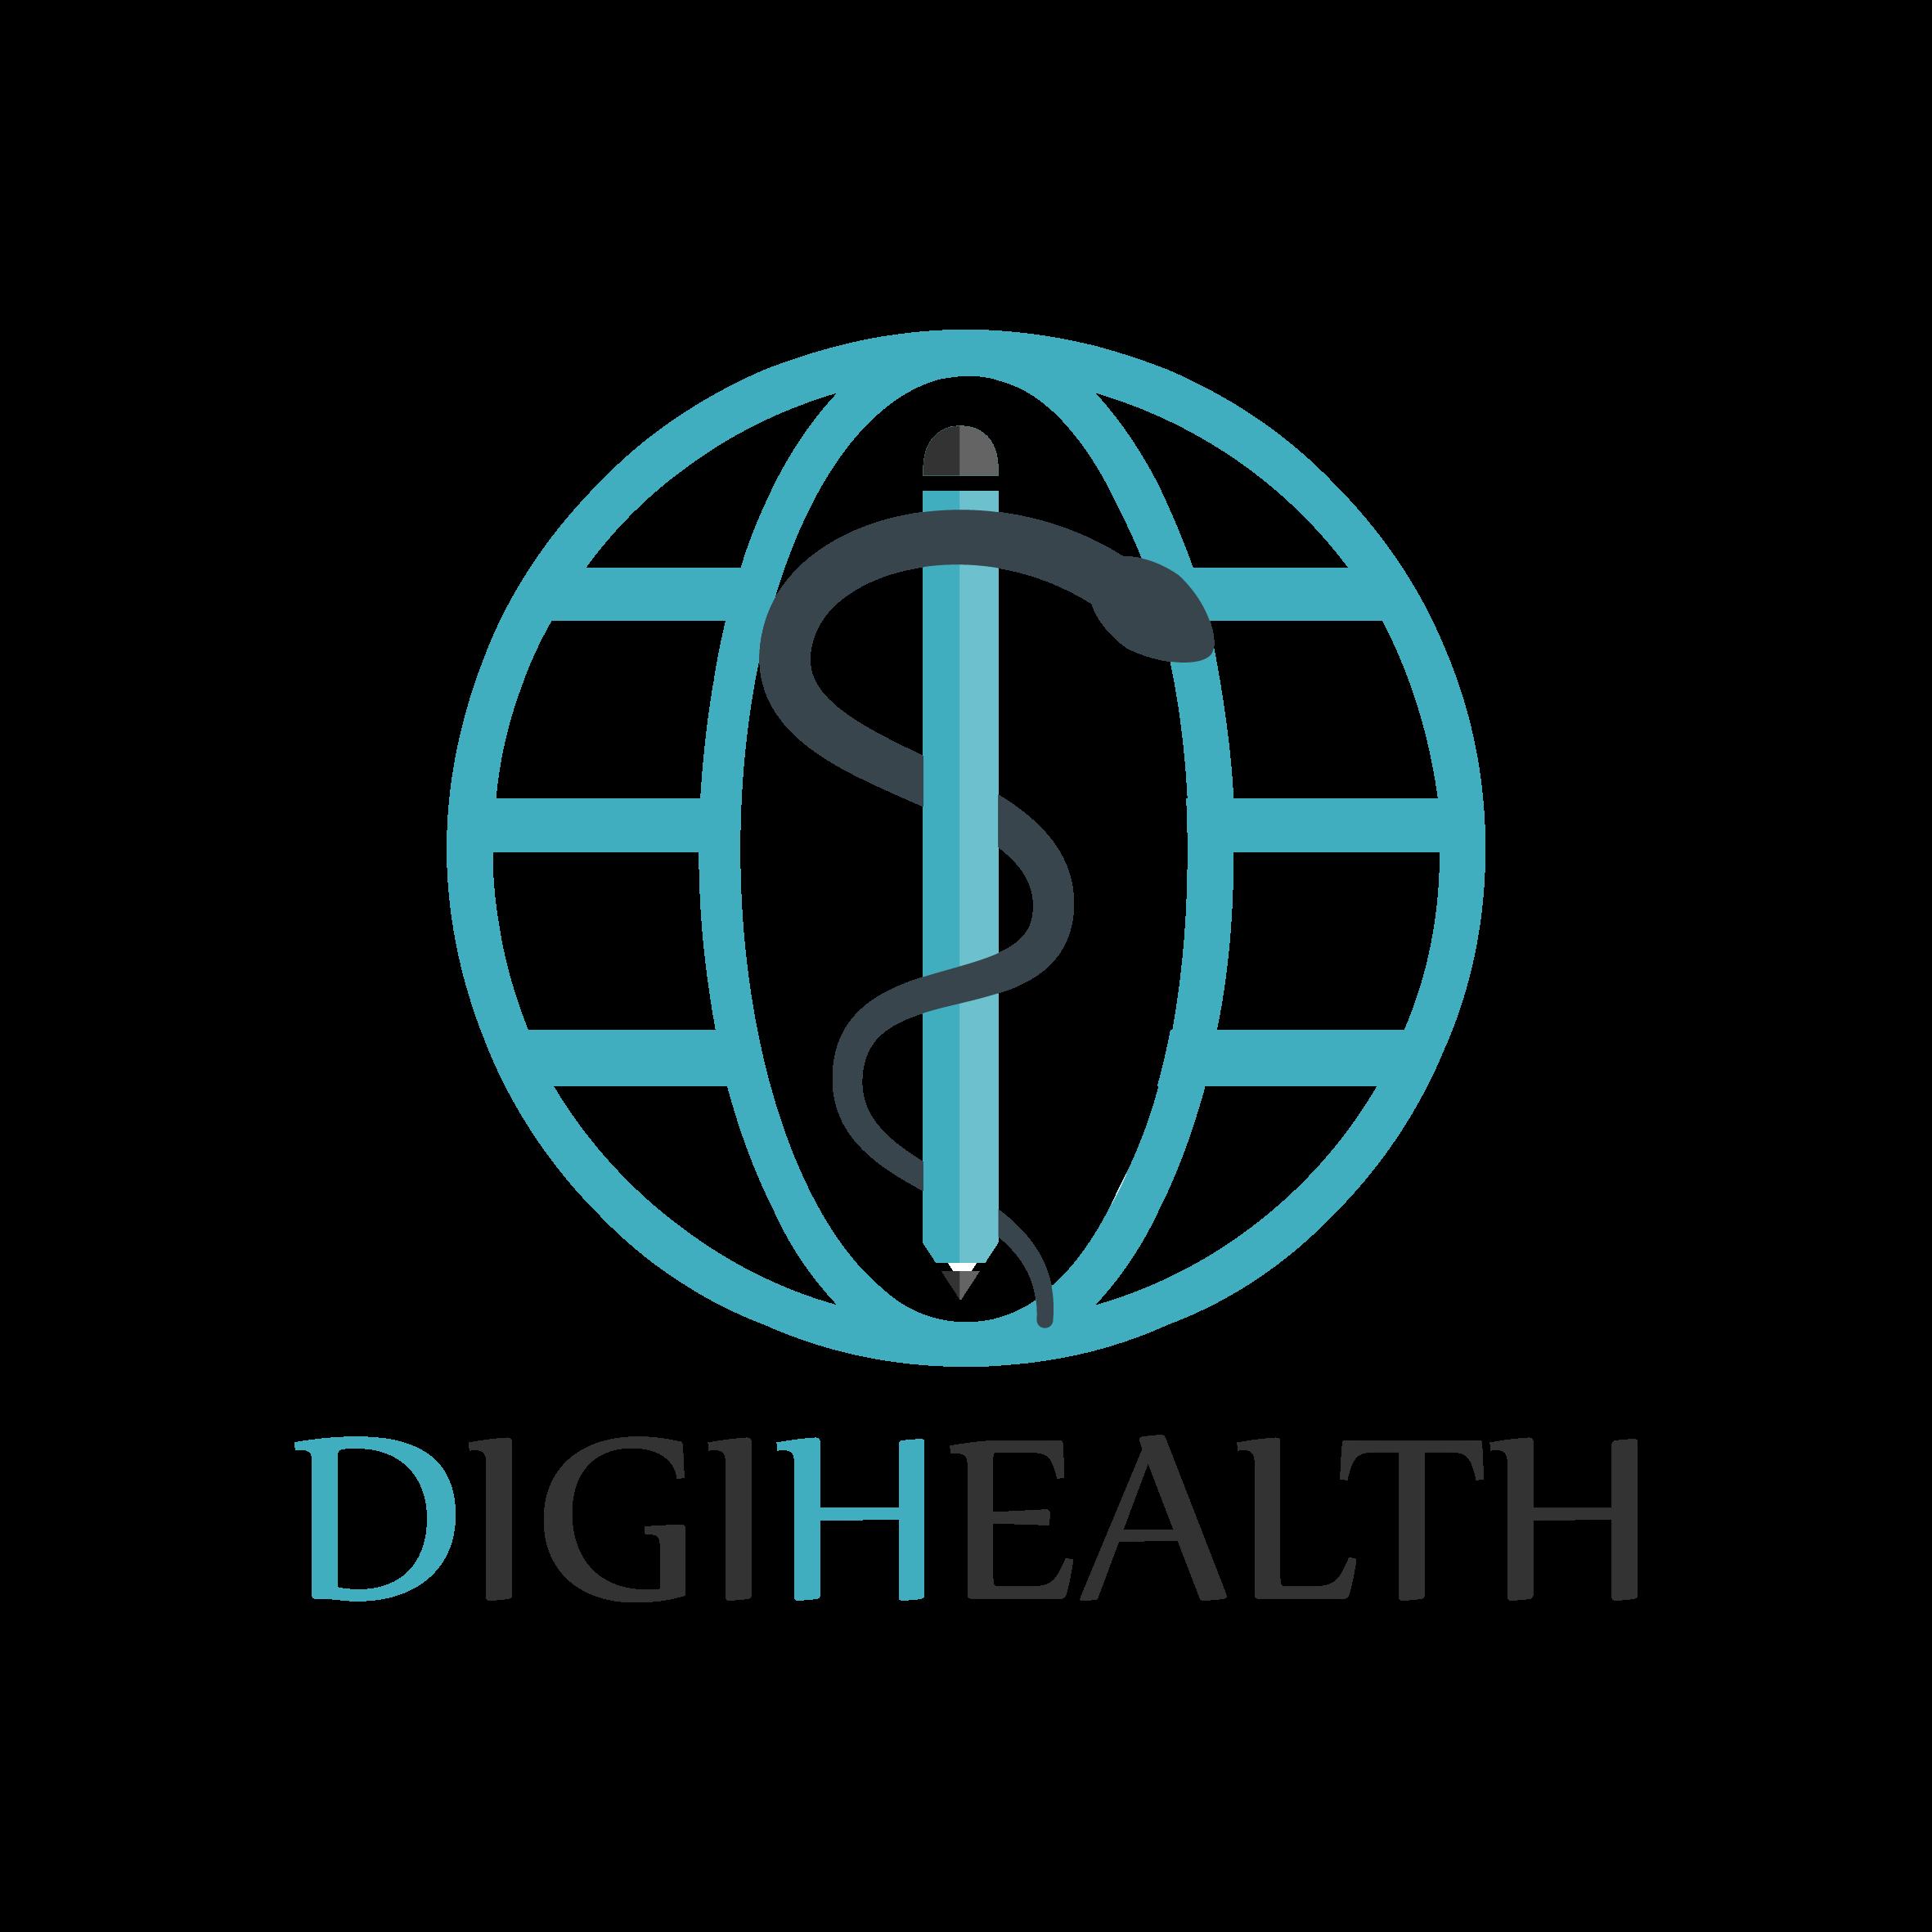 DIGIHEALTH